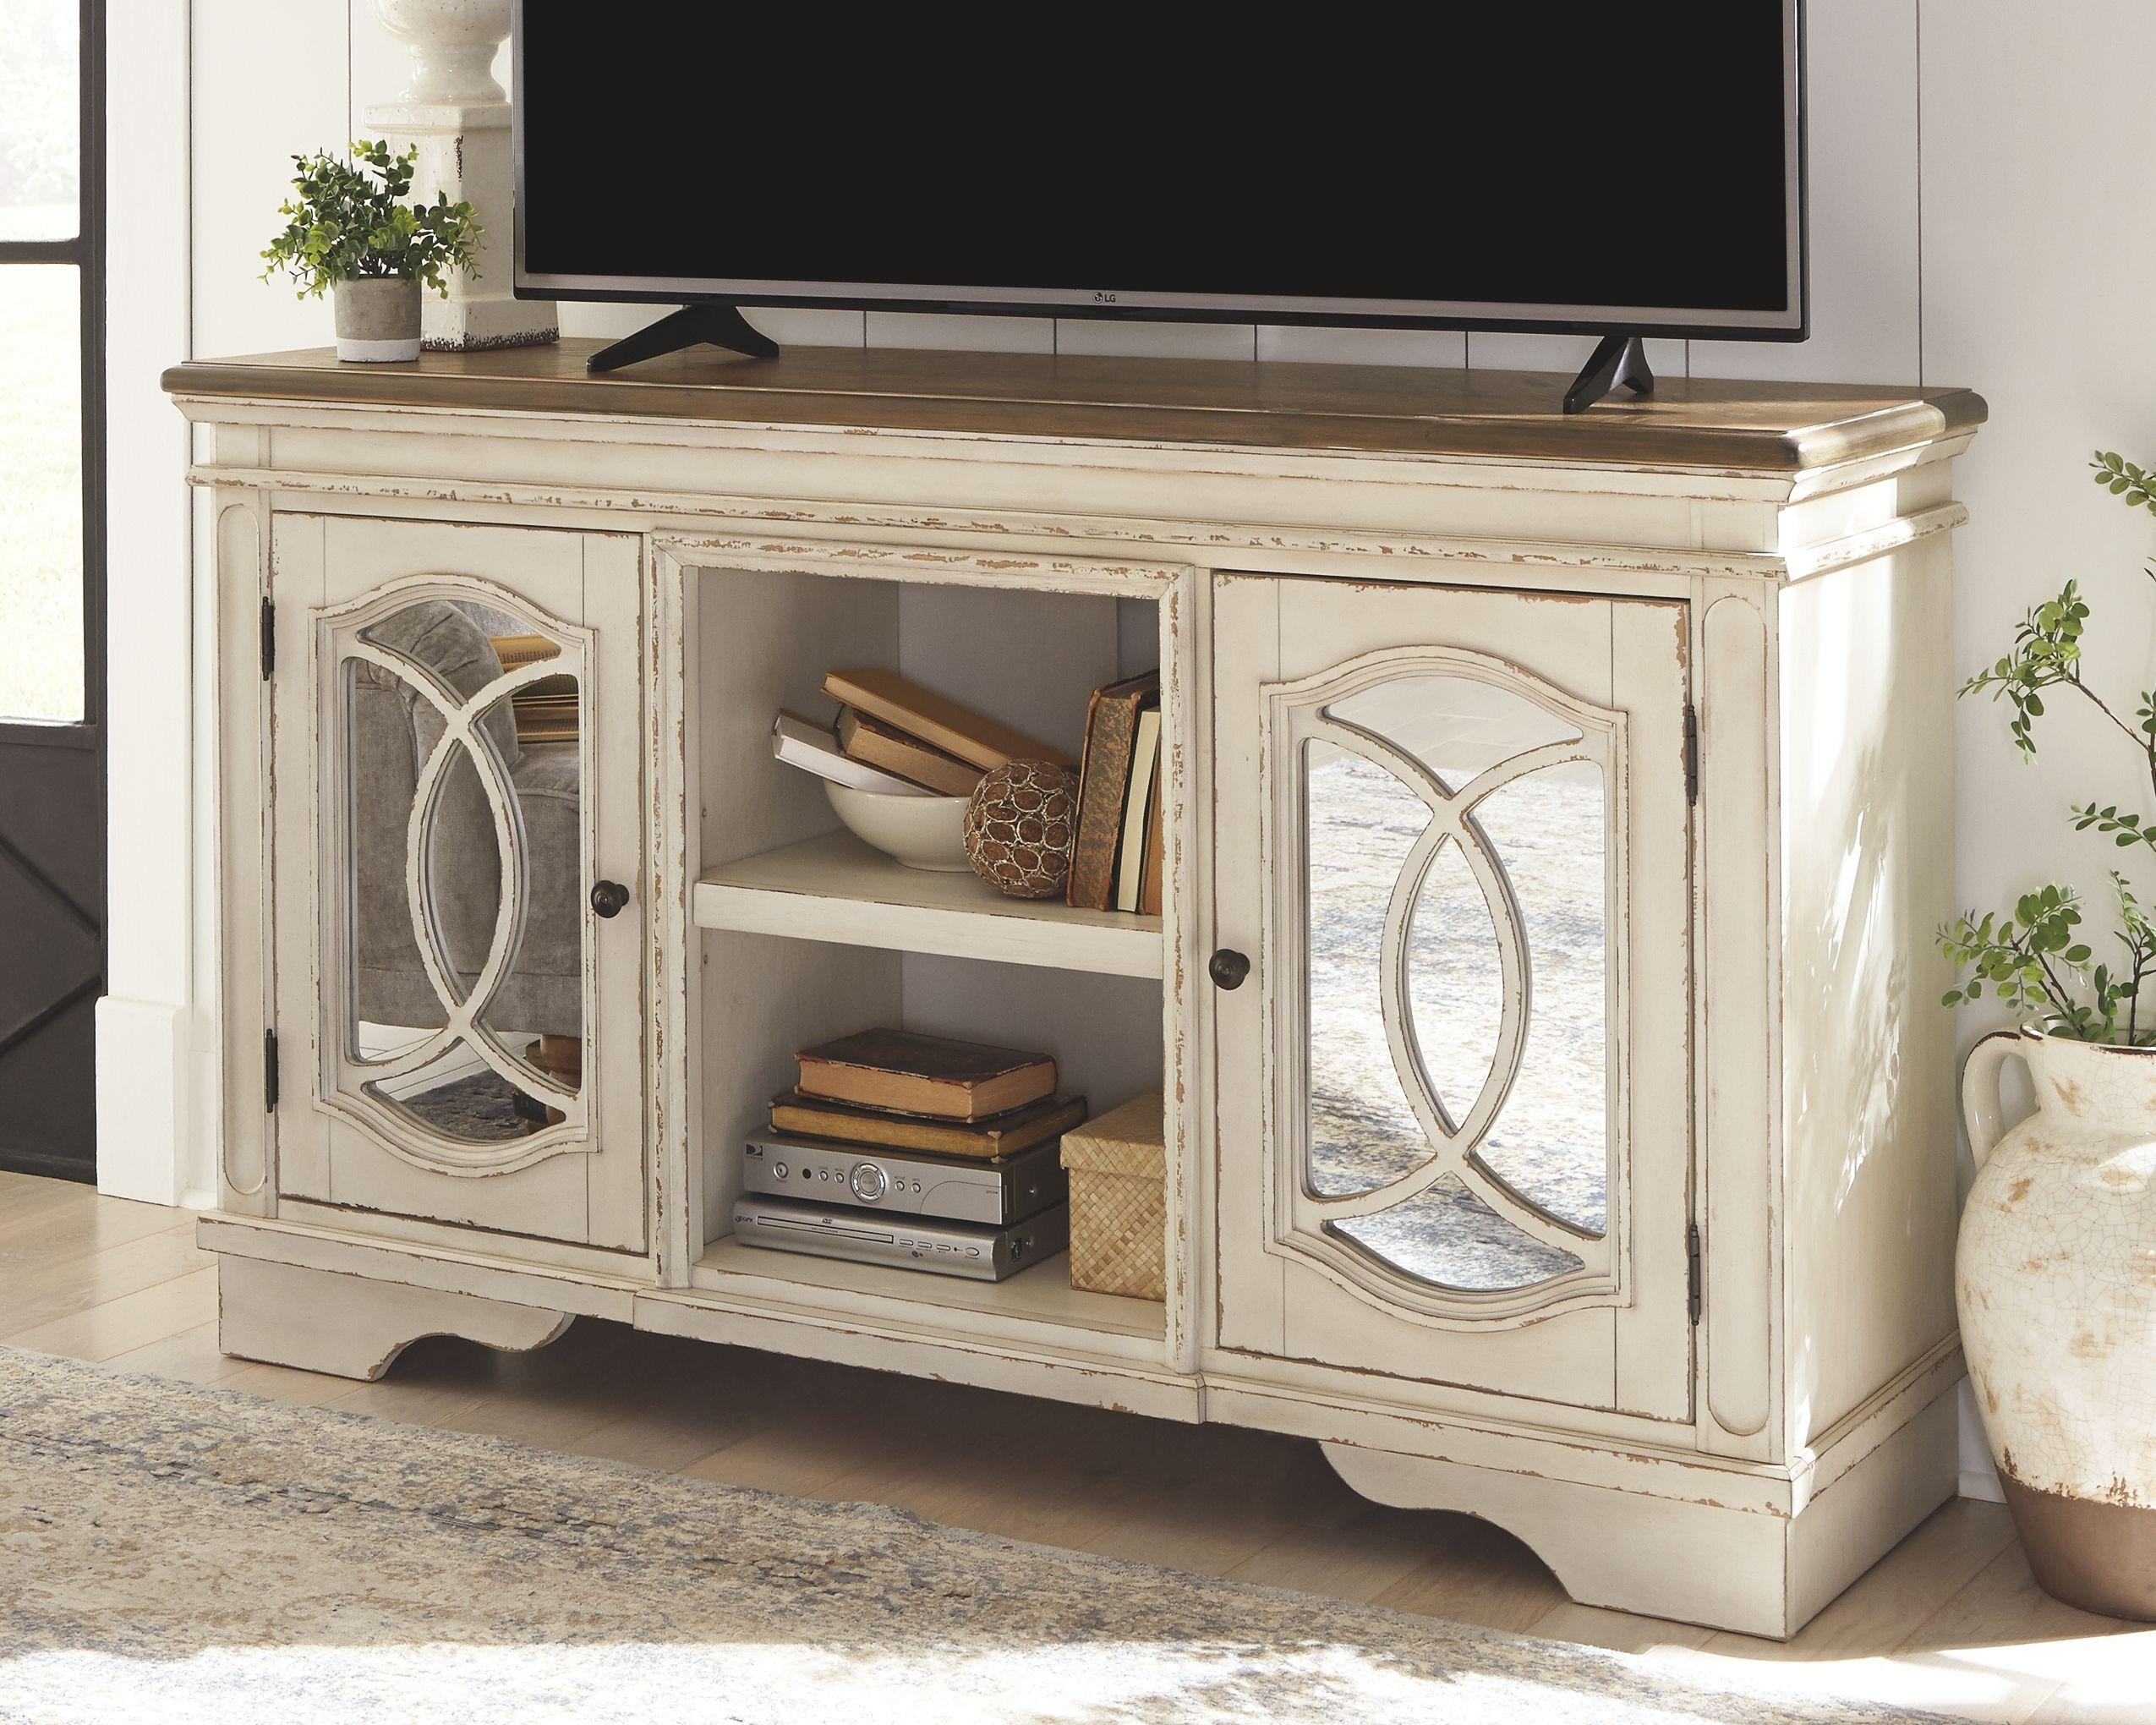 Realyn 62 Tv Stand Ashley Furniture Homestore Tv Stand Rustic Tv Stand Tv Stand Wood